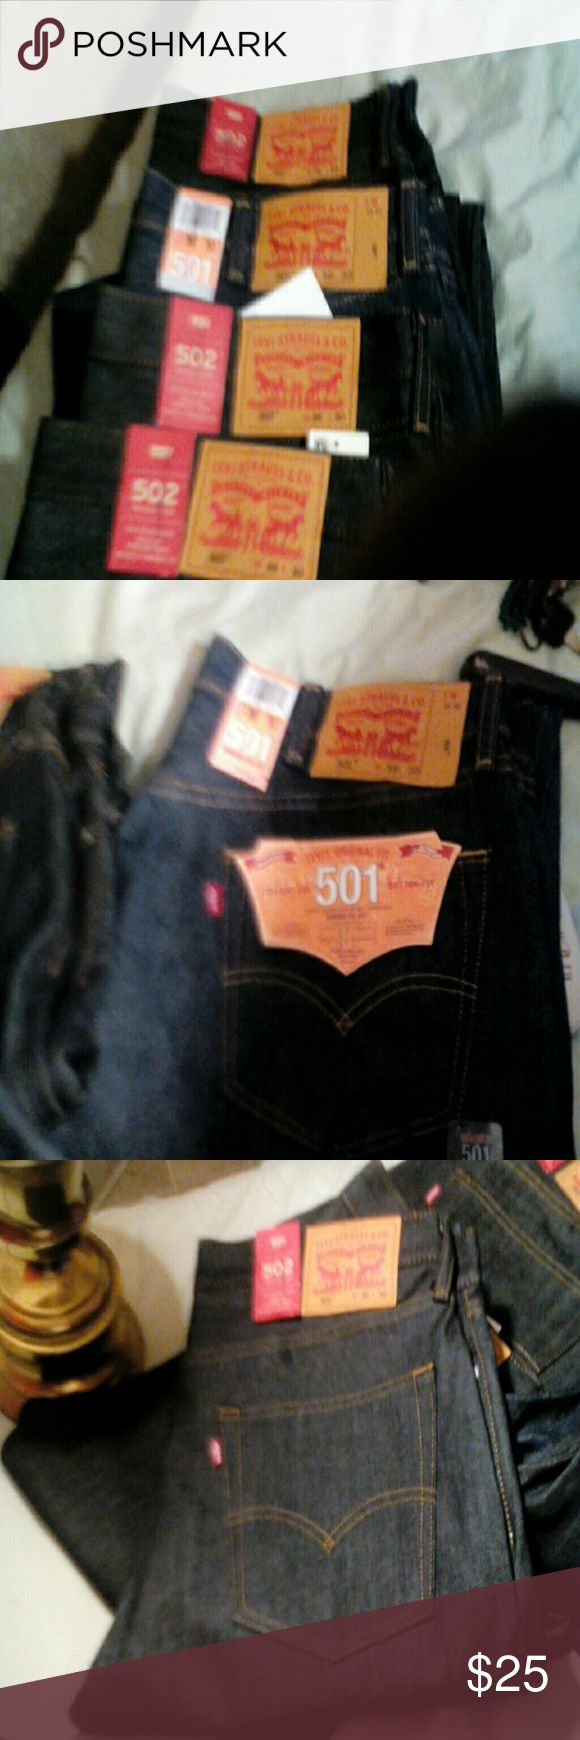 Levis New jeans,501 levis Jeans Straight